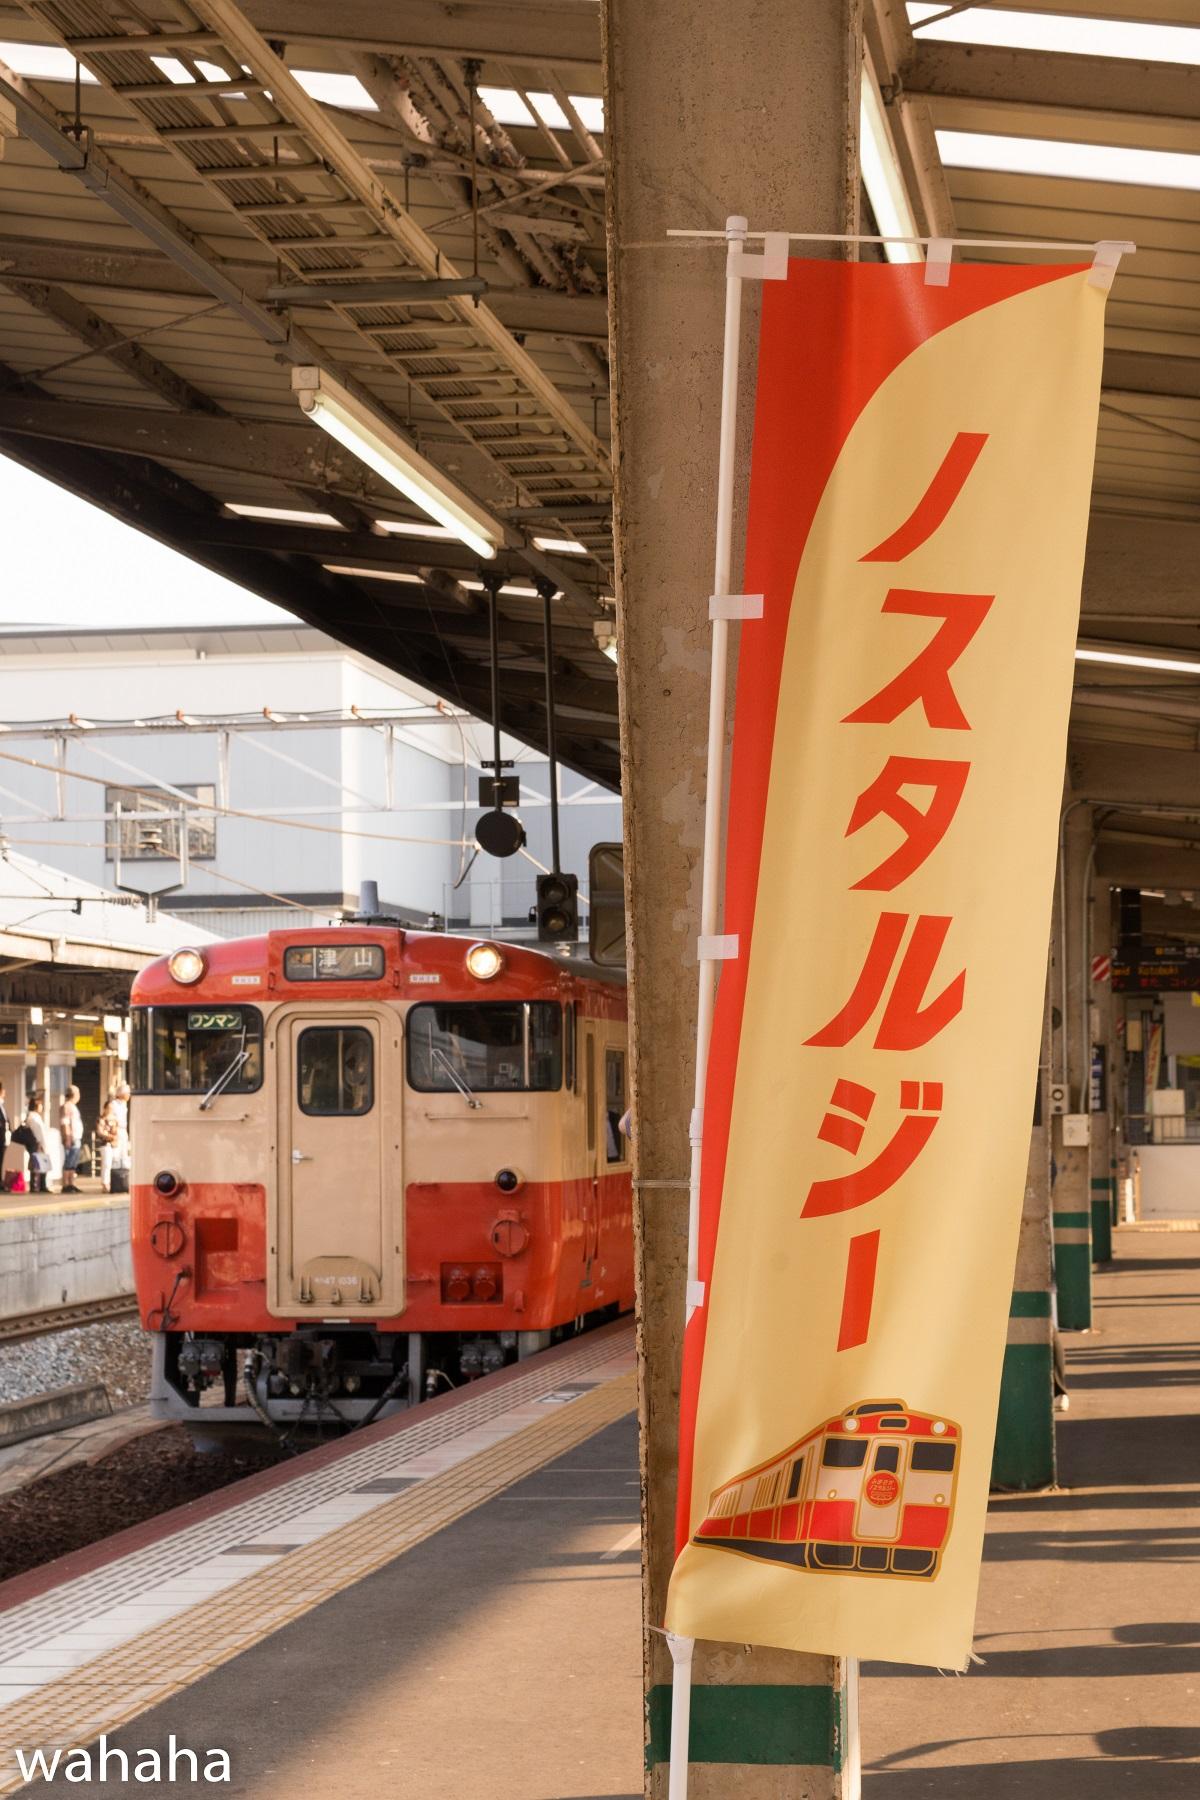 280522okayama-14-05p.jpg